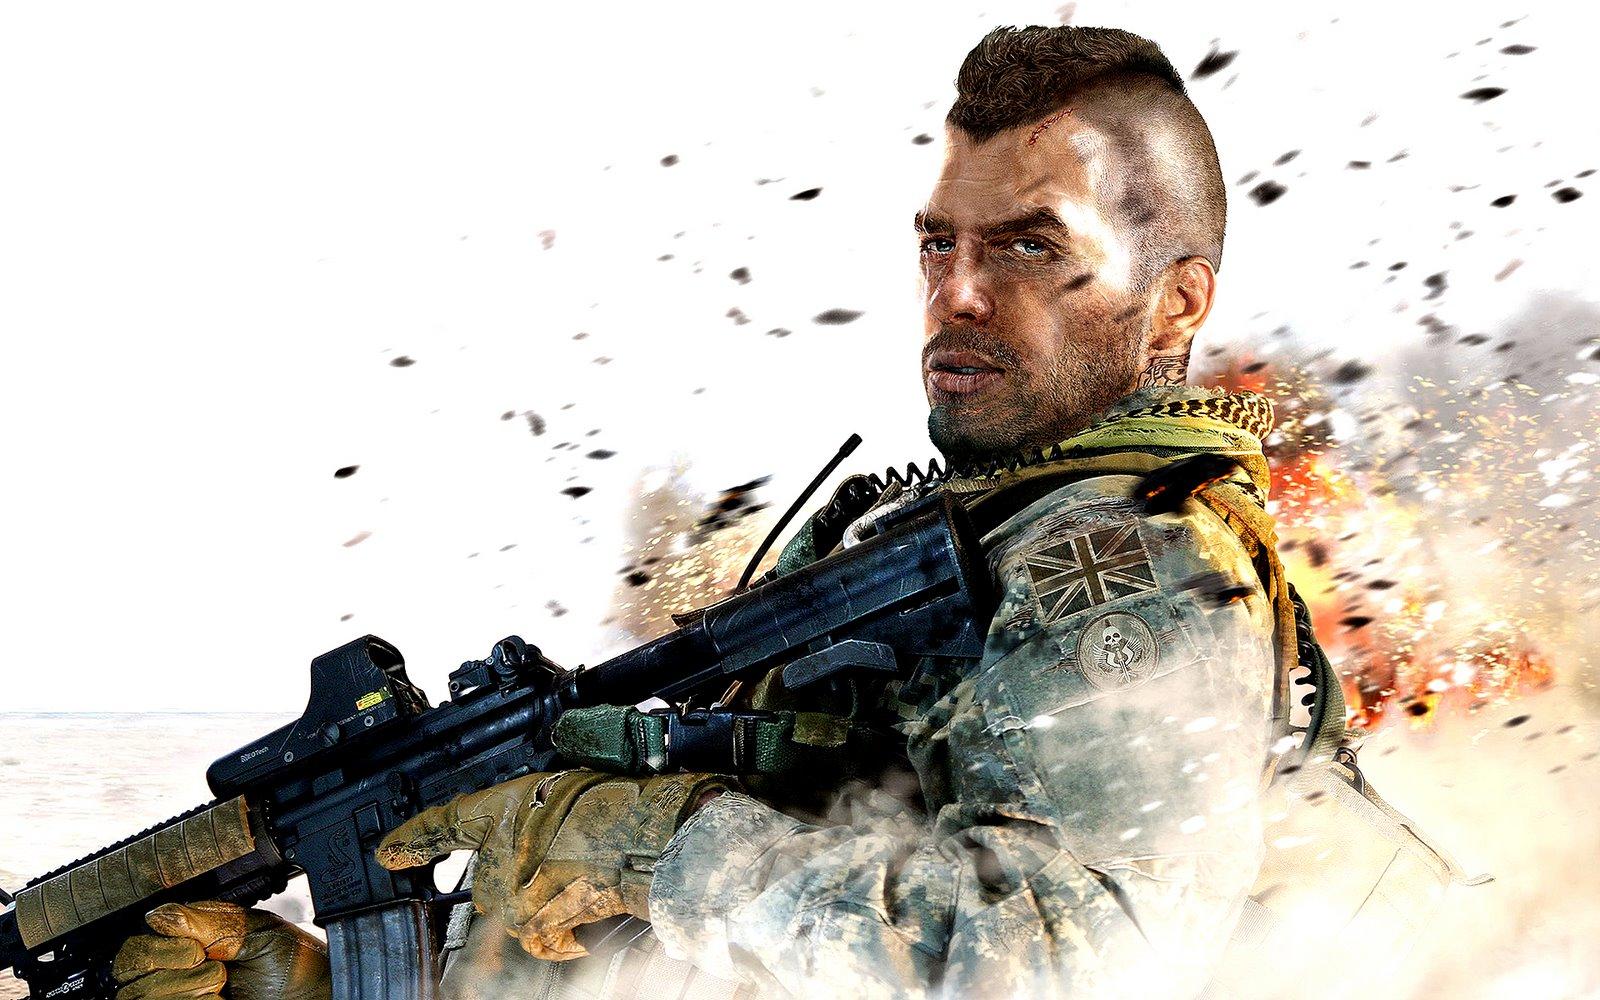 Call Of Duty Wallpaper Hd: Wallpapers Box: COD6 Modern Warfare 2 HD Wallpapers